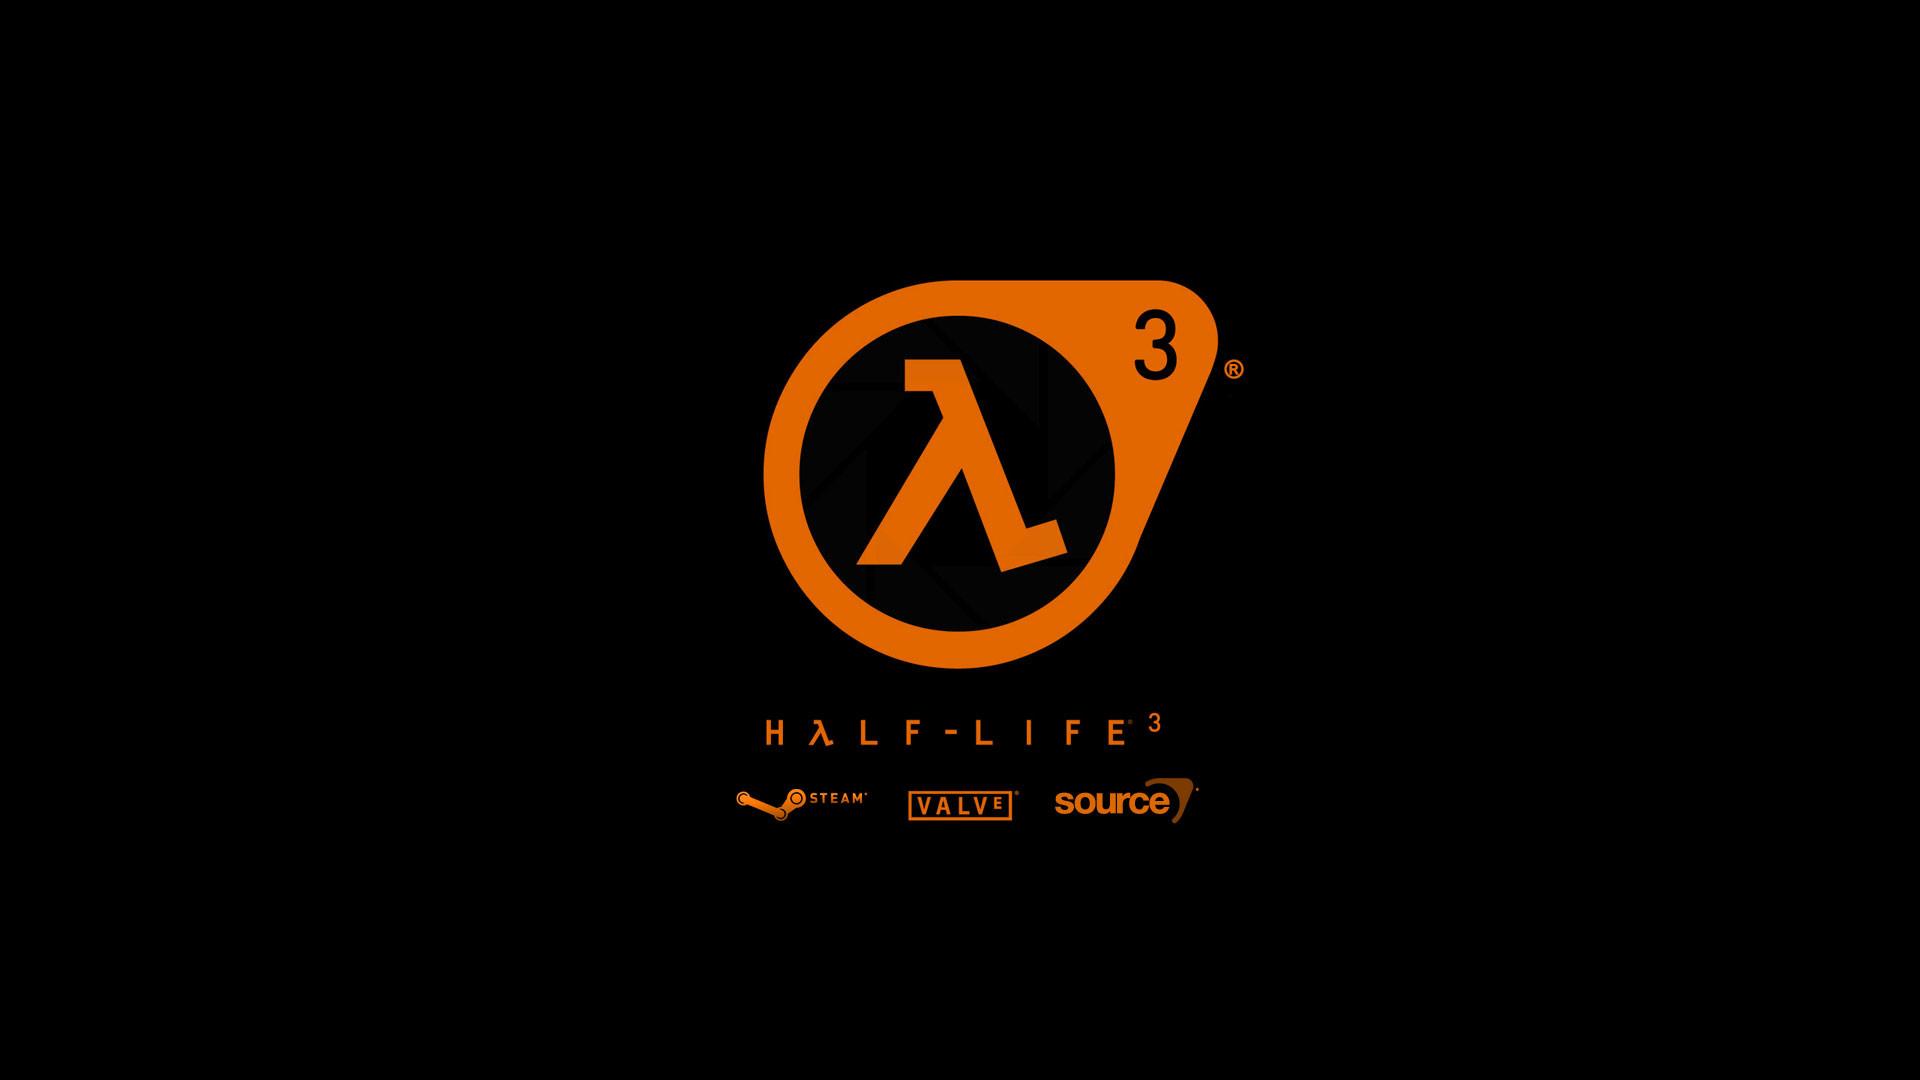 Gabe Newell: Valve Still Working On Single-Player Games – Xbox One, Xbox  360 News At XboxAchievements.com